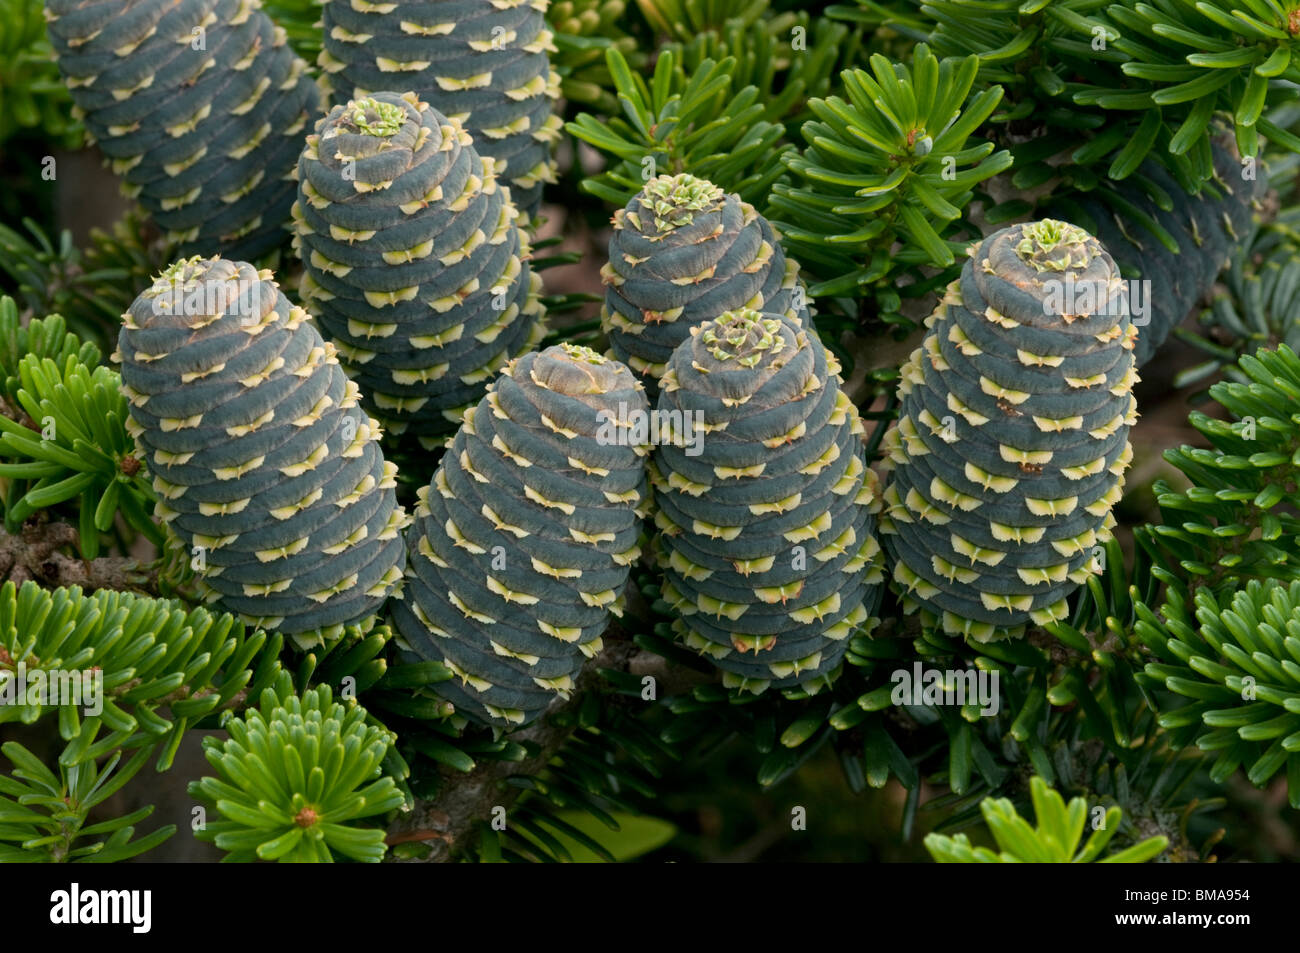 Korean Fir (Abies koreana), variety: Taiga, twig with cones. - Stock Image